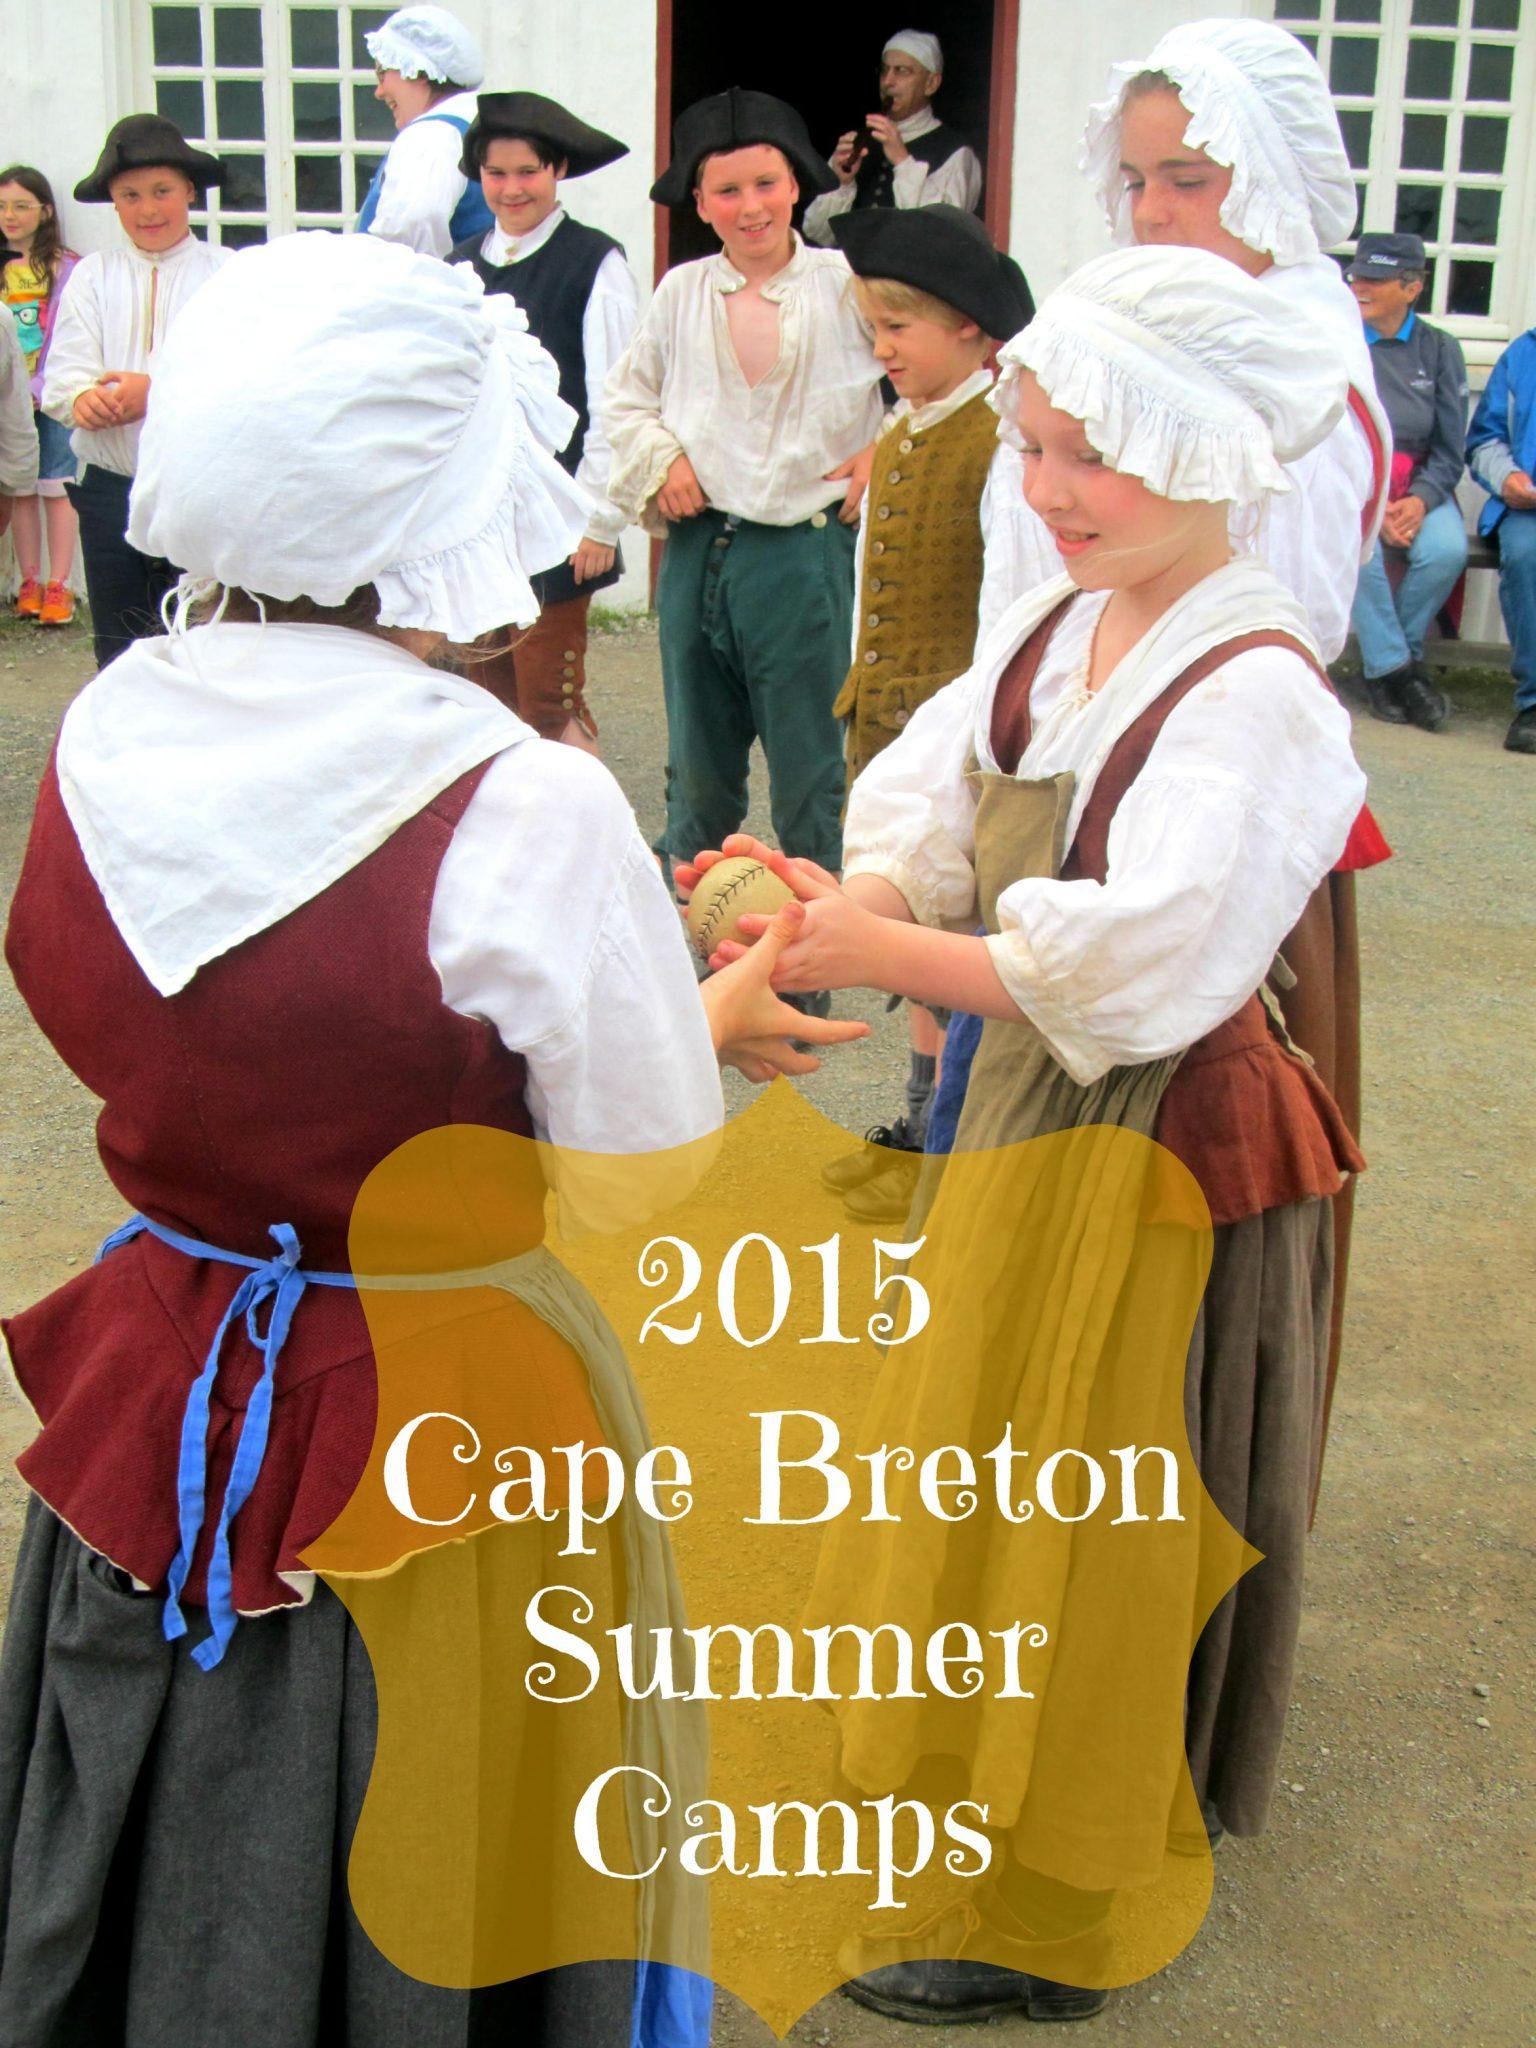 2015 cape breton summer camps